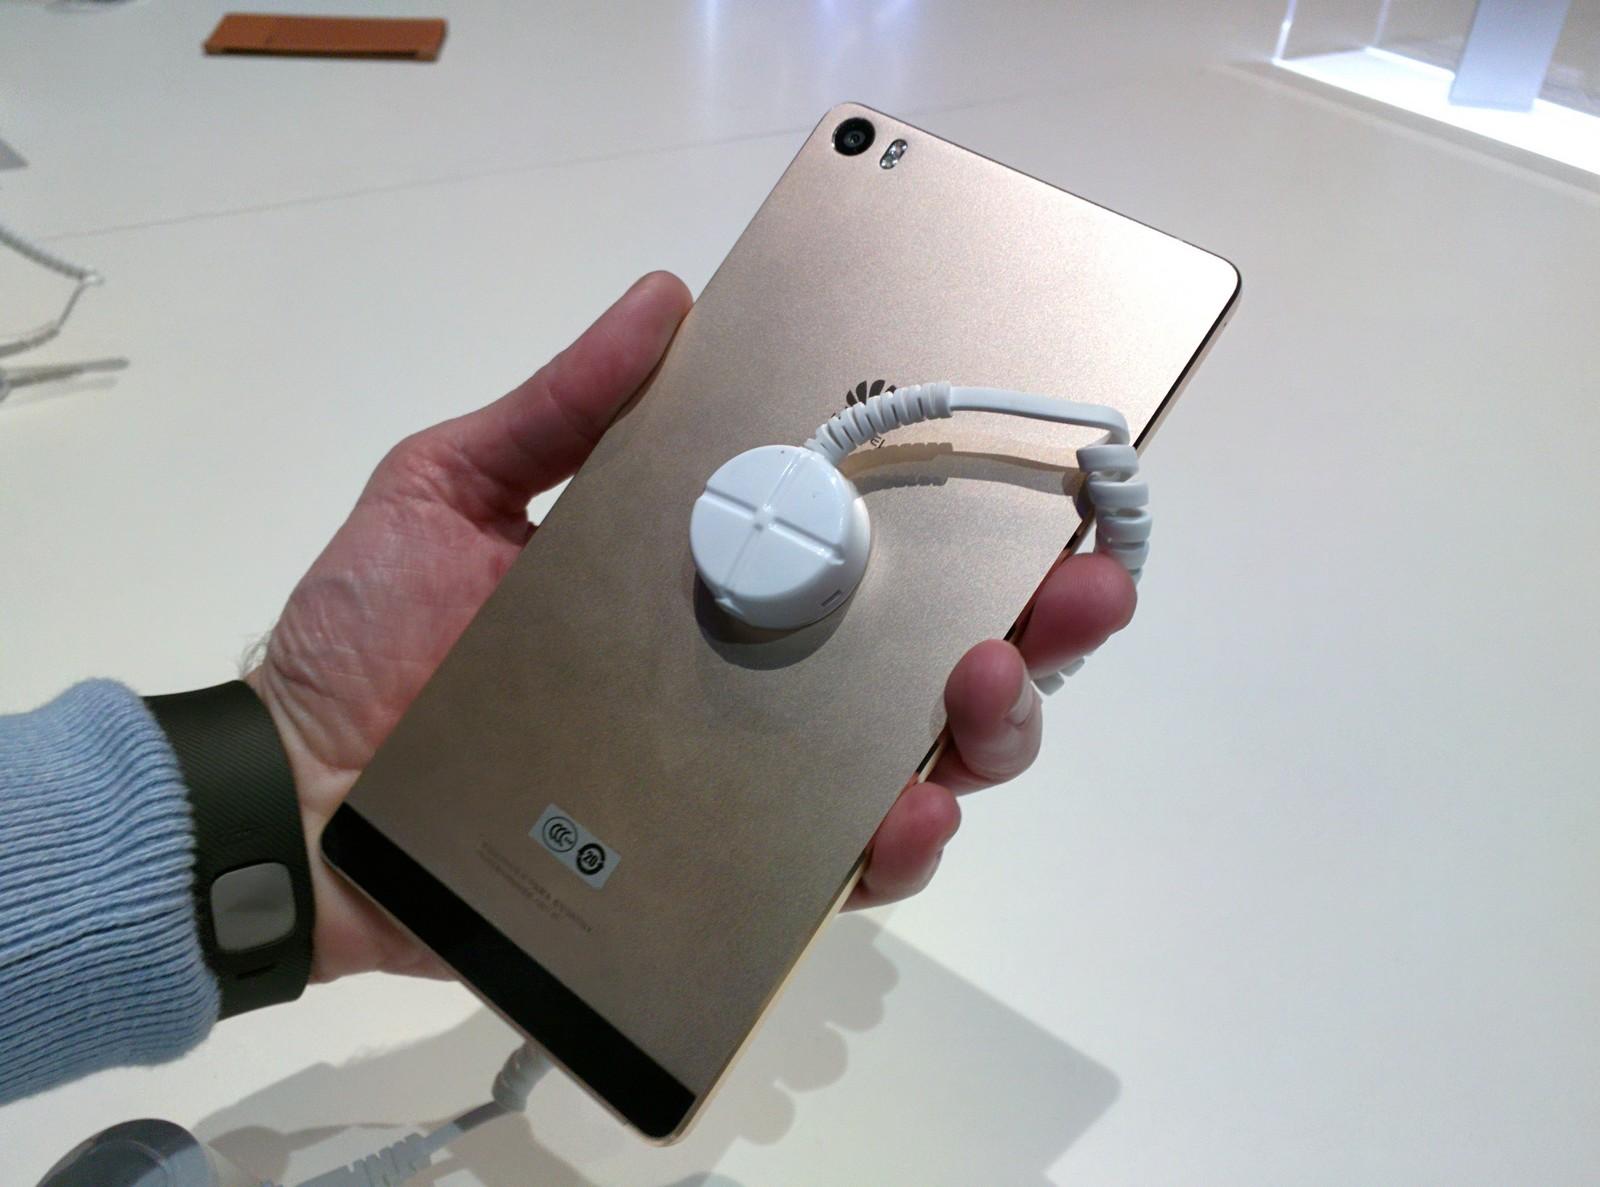 Huawei-Ascend-P8-Max-2